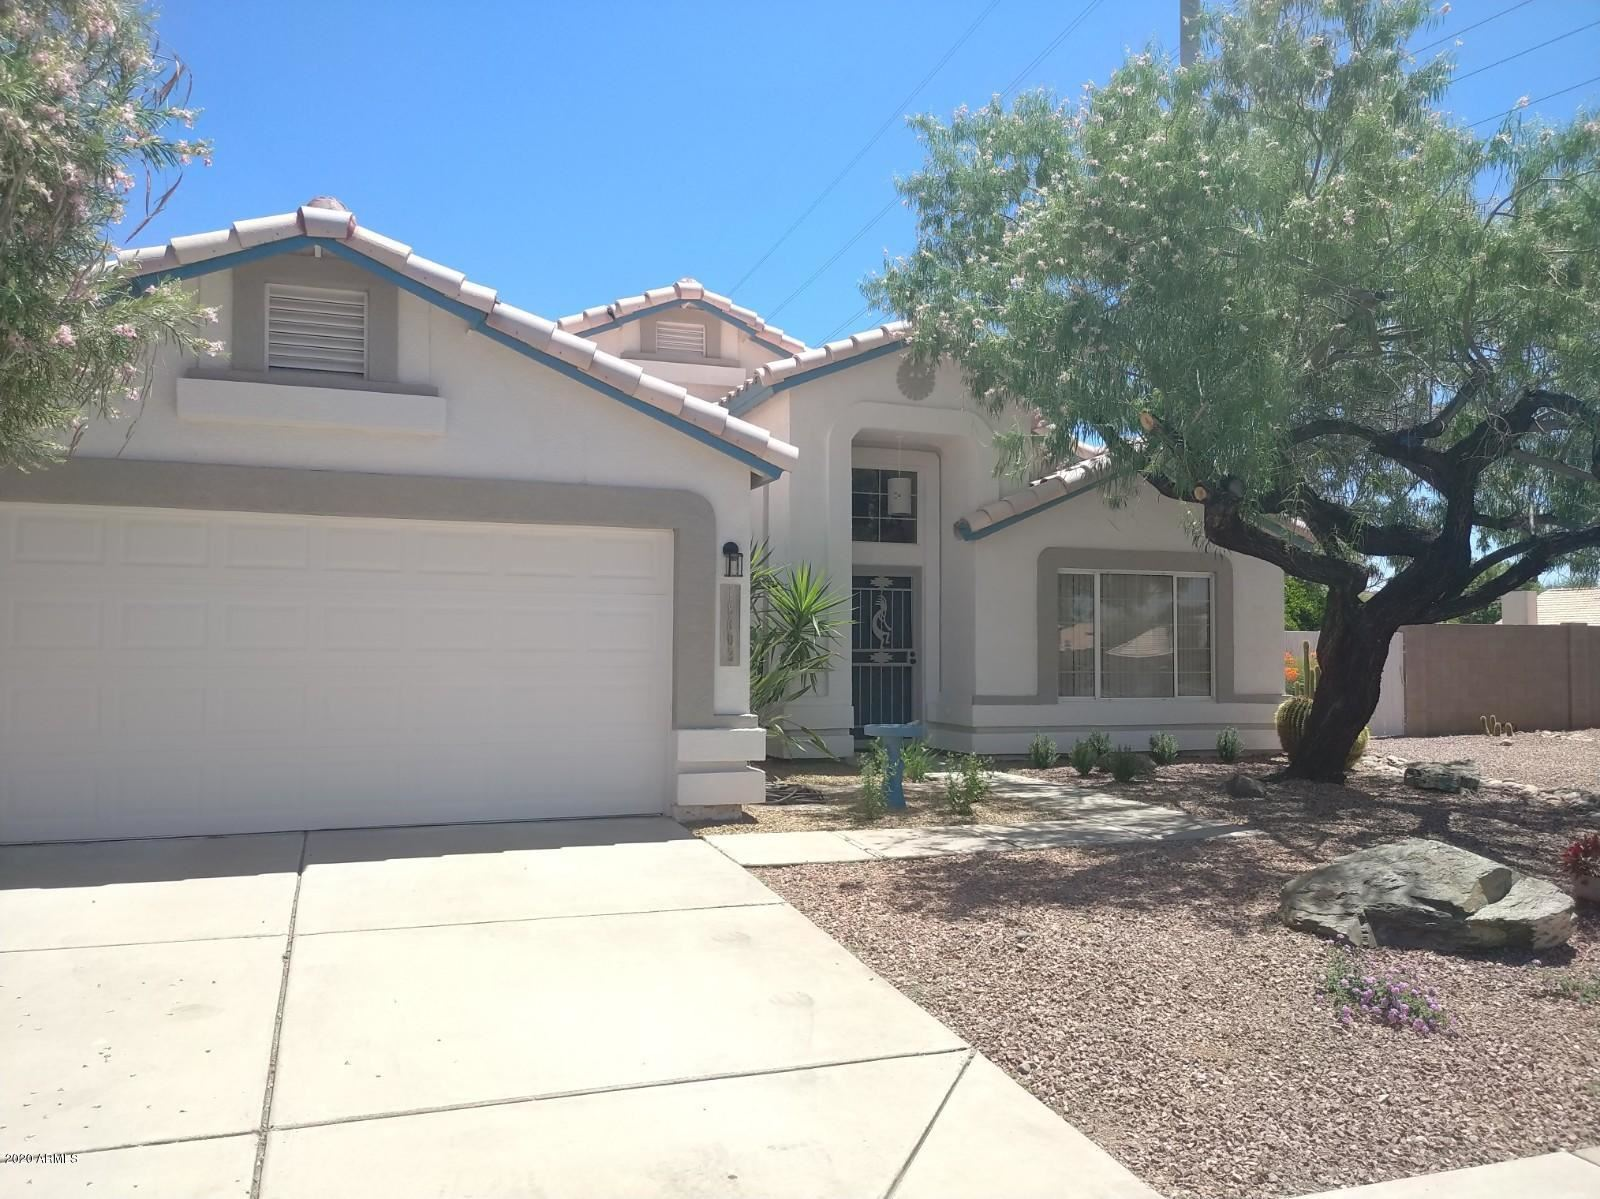 18603 N 30TH Place, Phoenix, AZ 85050 - MLS#: 6081637